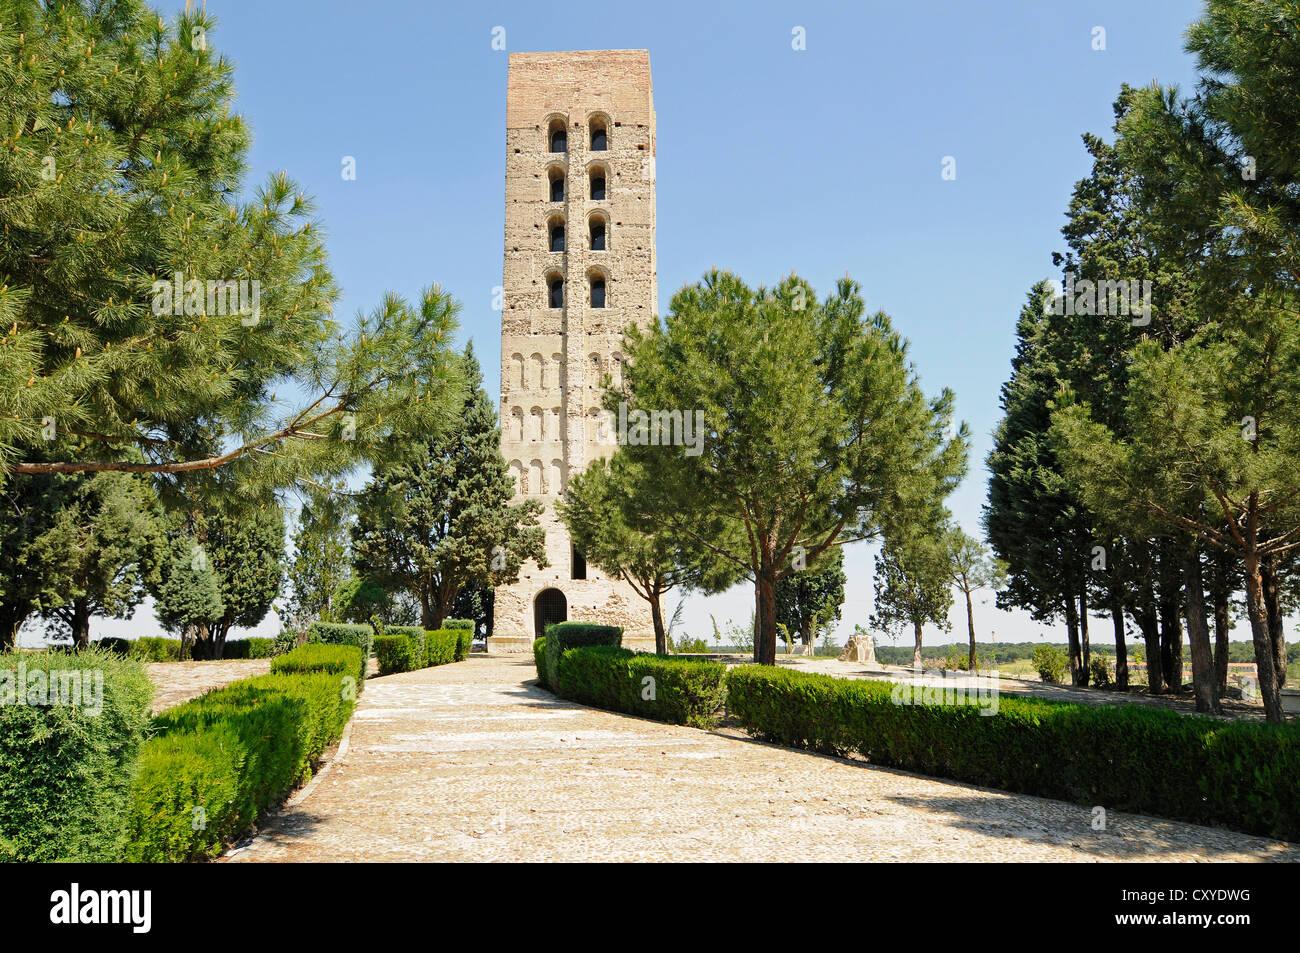 Toore Mudejar, Moorish tower, Coca, Segovia province, Castile and León, Spain, Europe, PublicGround - Stock Image